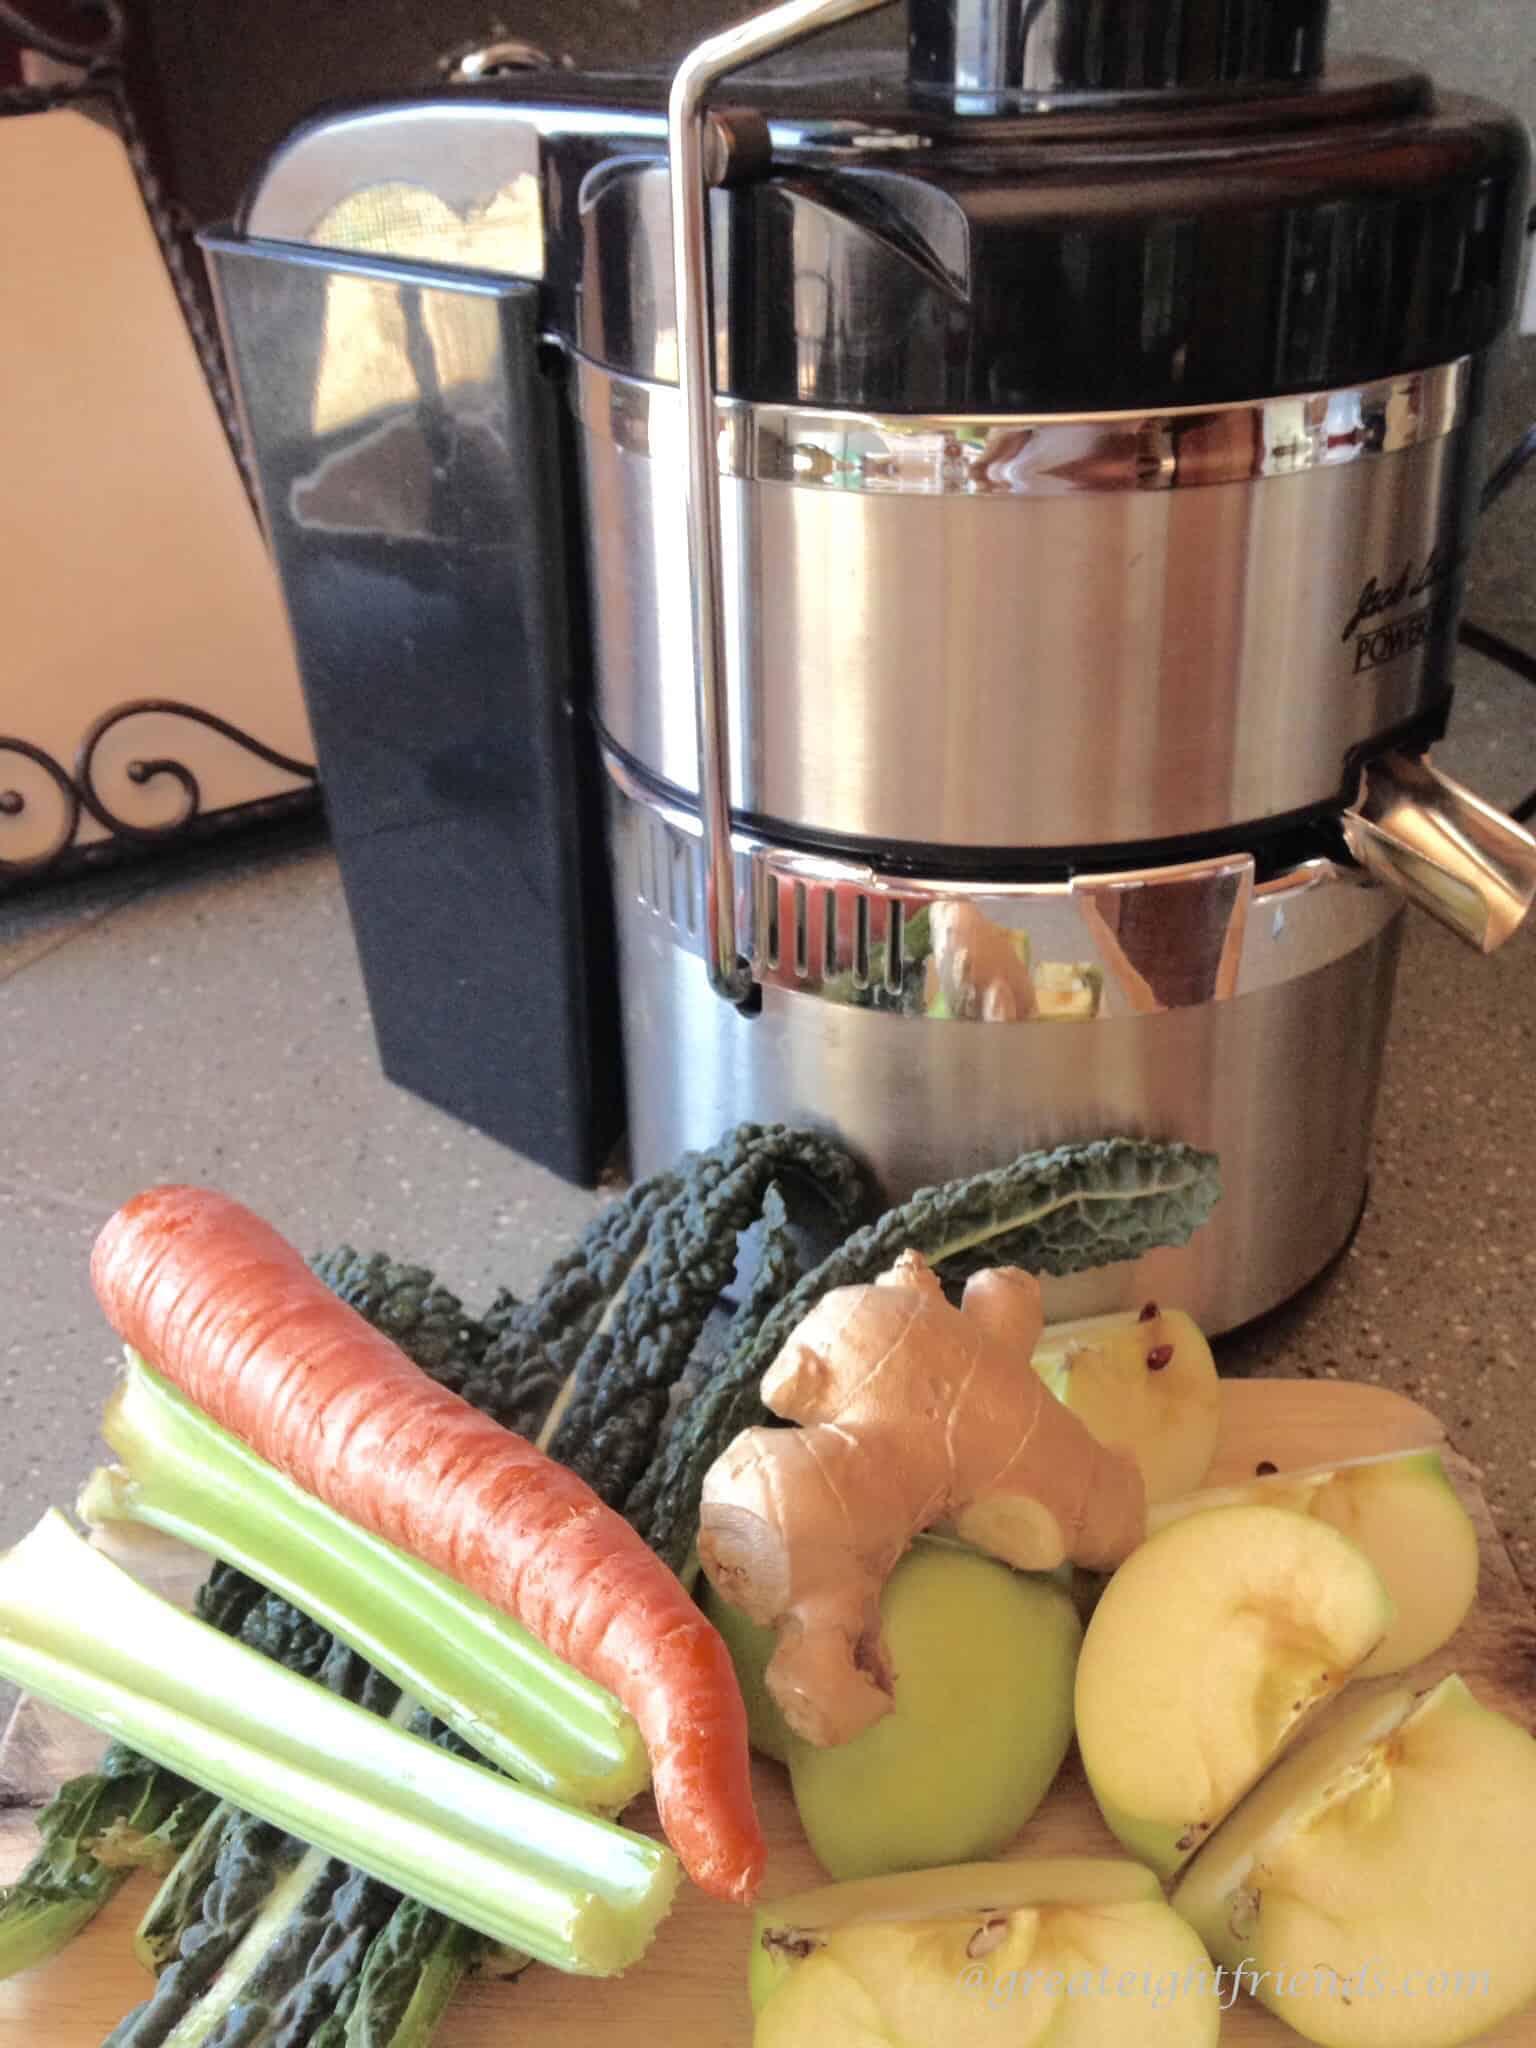 Juicer and veggies